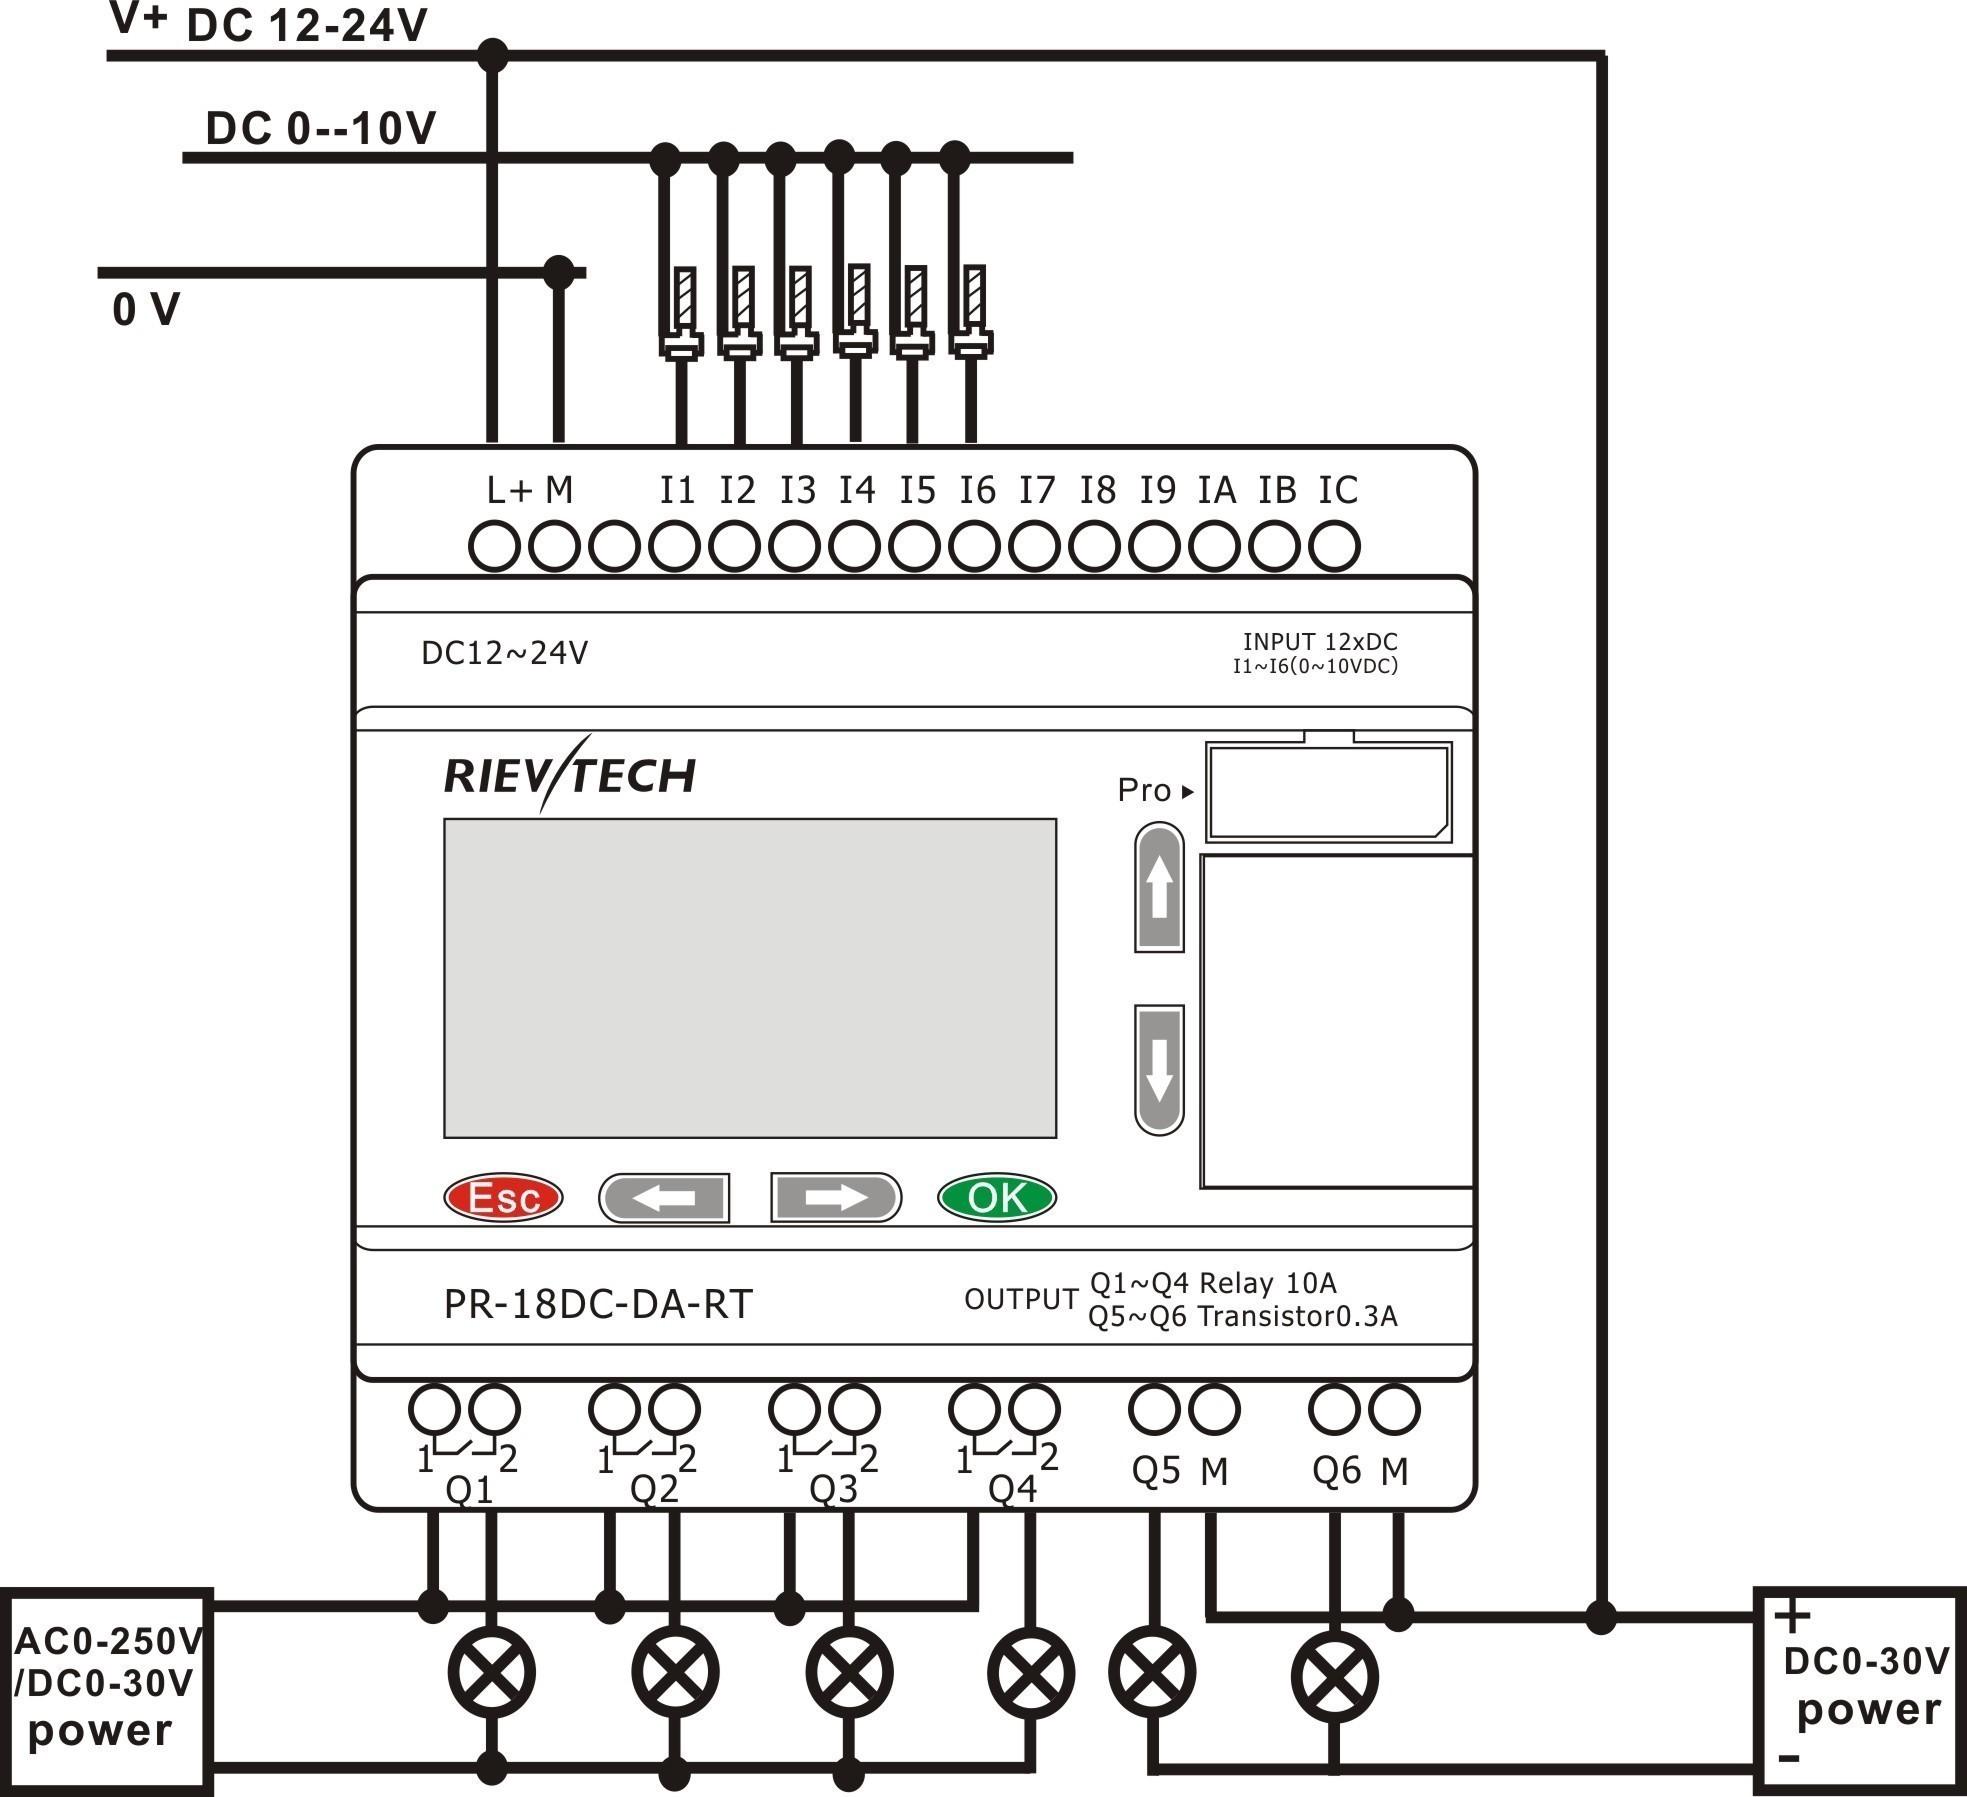 Plcm7500 wiring diagram wiring diagram image wiring diagram for plc inspirationa wiring diagram with plc save typical plc wiring diagram fresh plc asfbconference2016 Choice Image